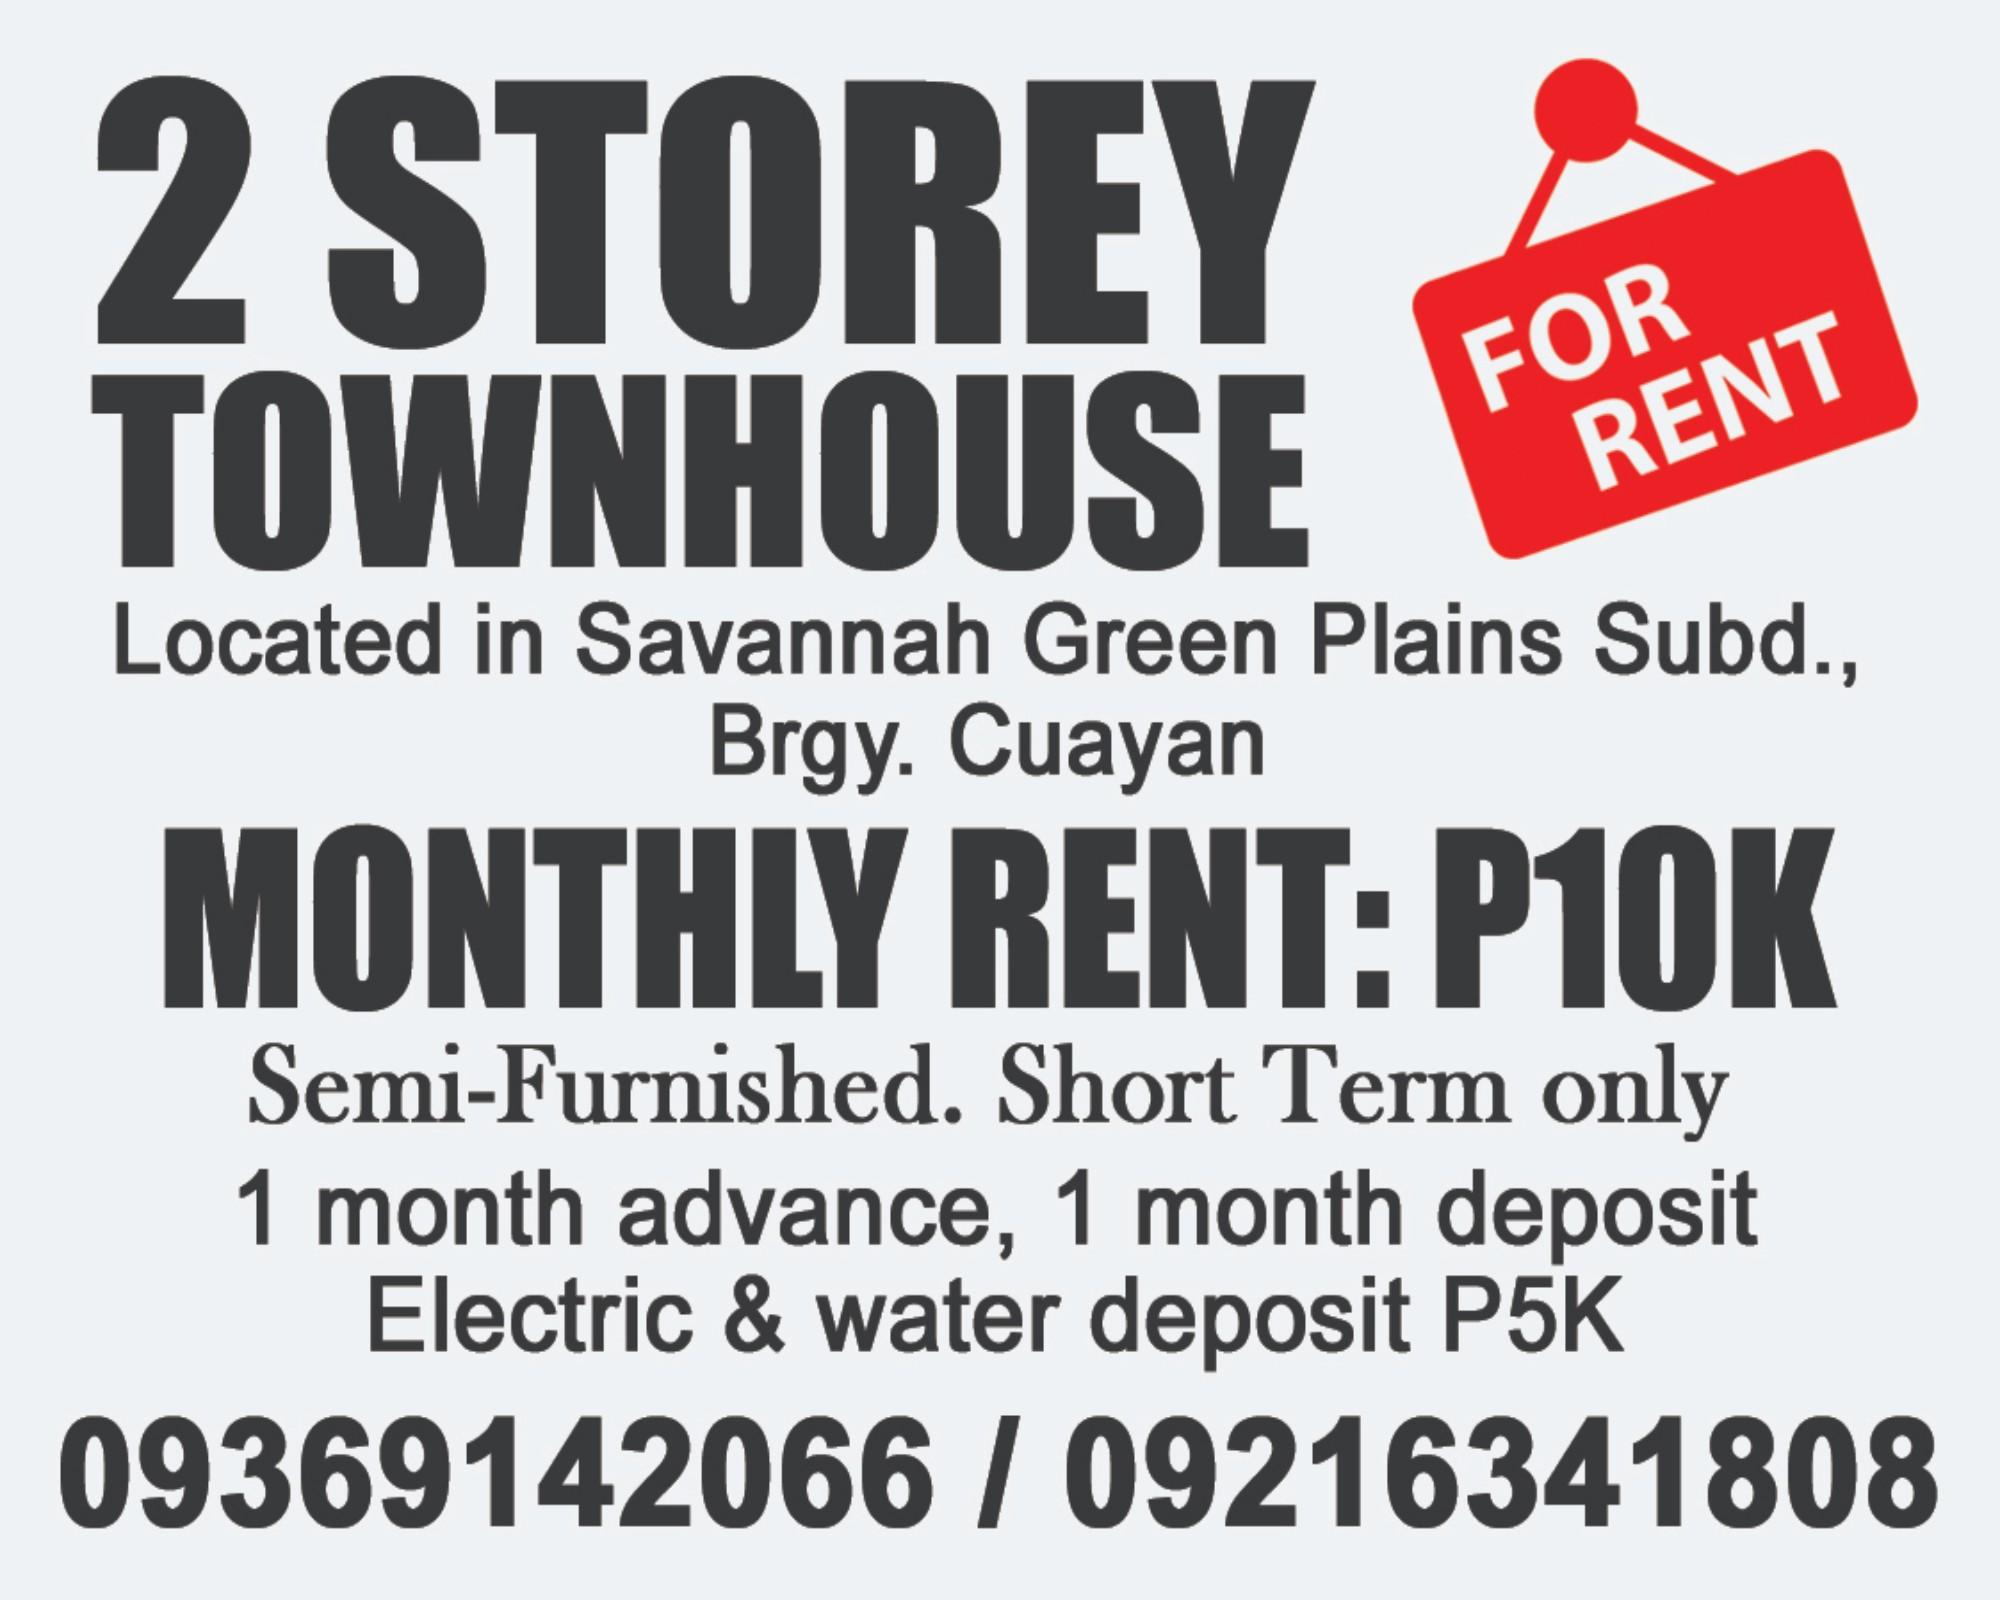 2 Storey Townhouse